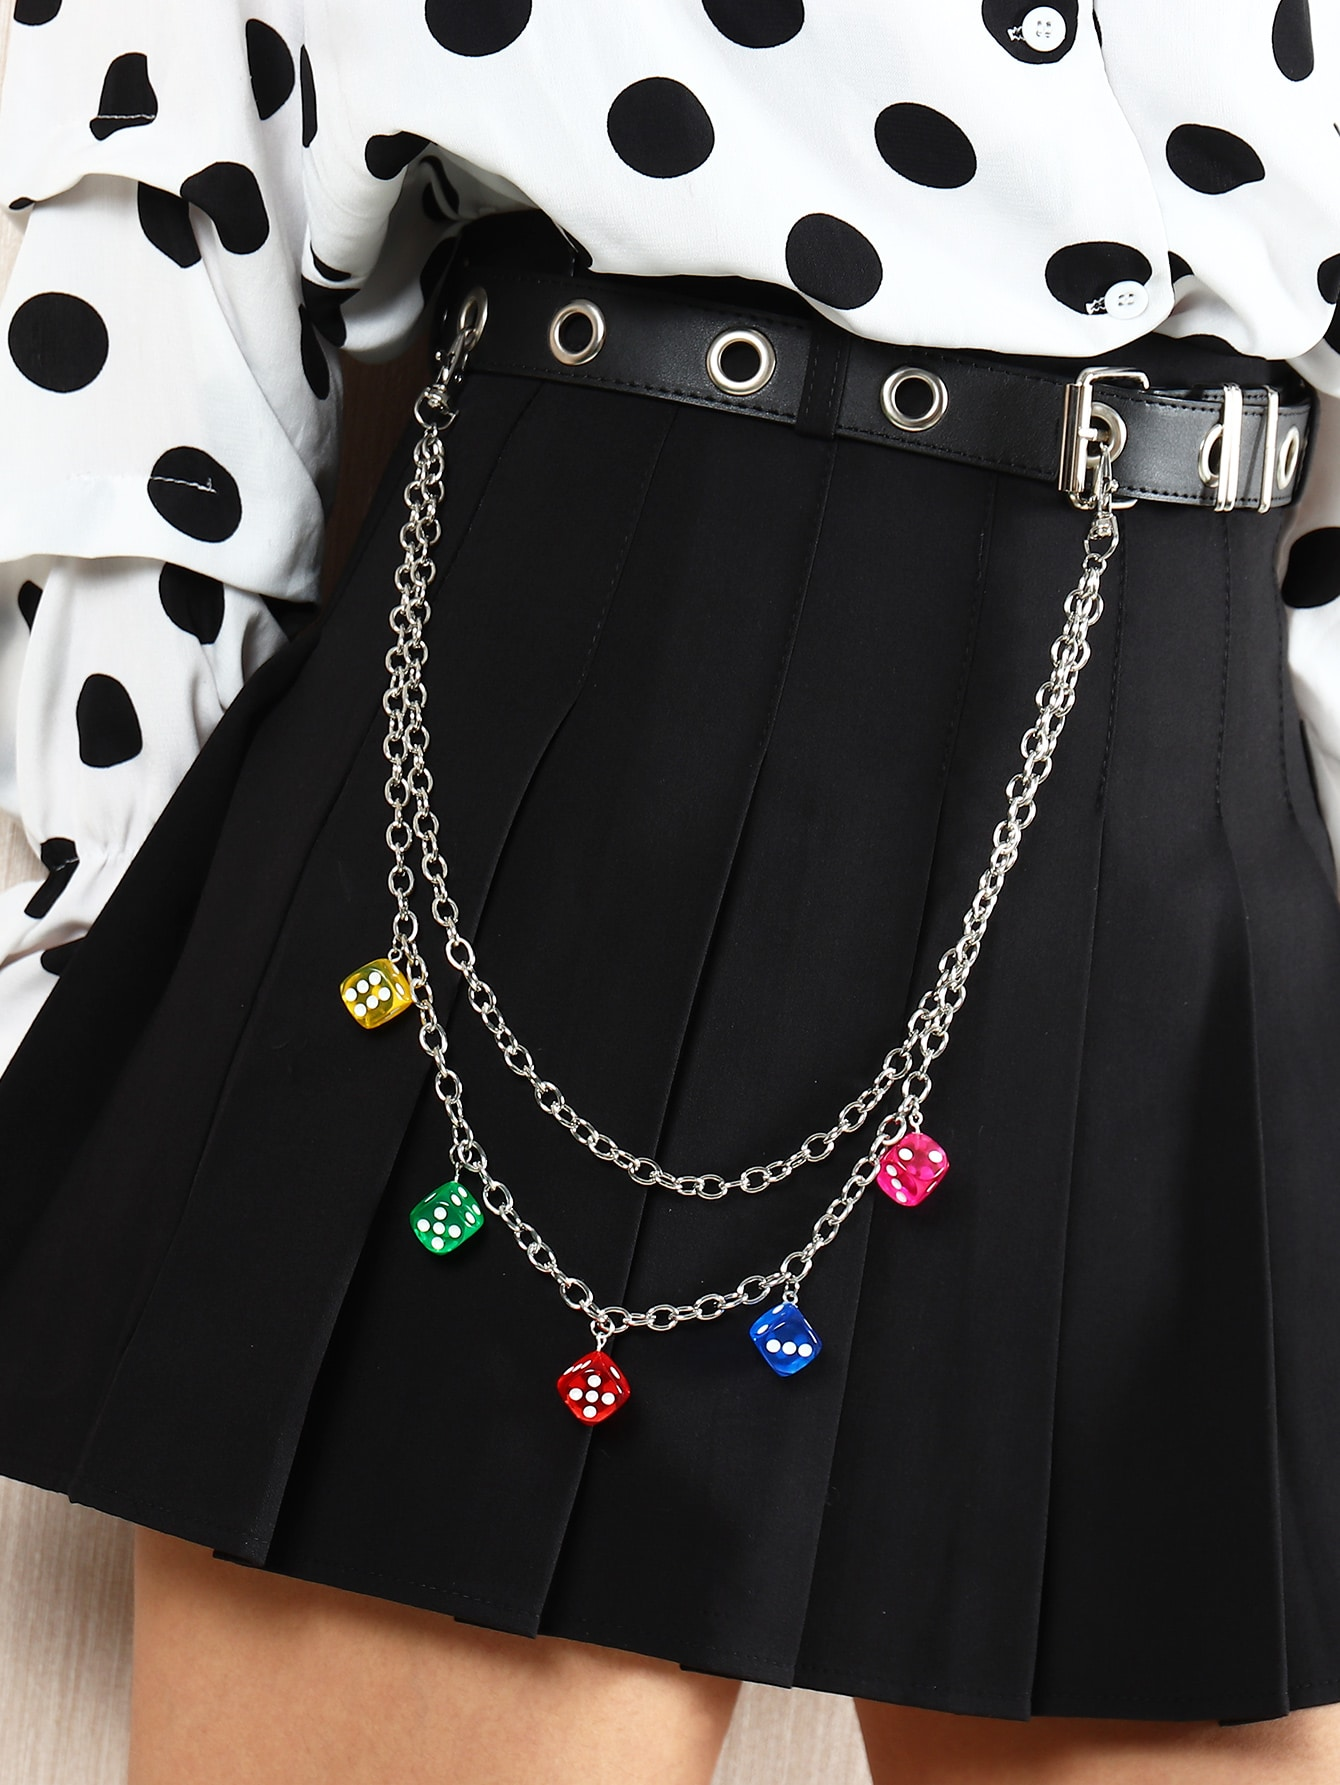 Dice Charm Pant Chain thumbnail